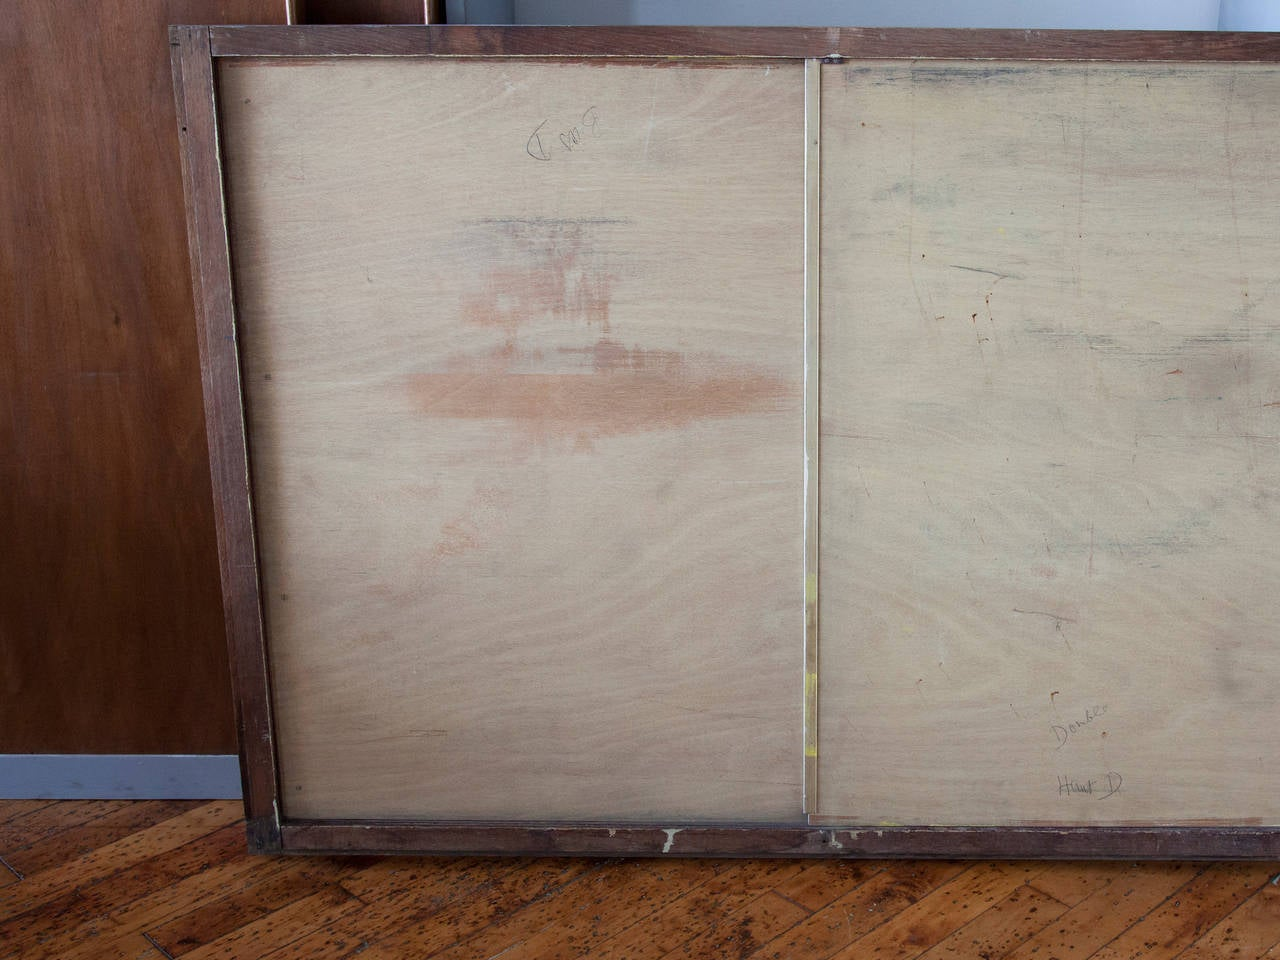 Jean Prouvé Sliding Cabinet Doors in Frames 6